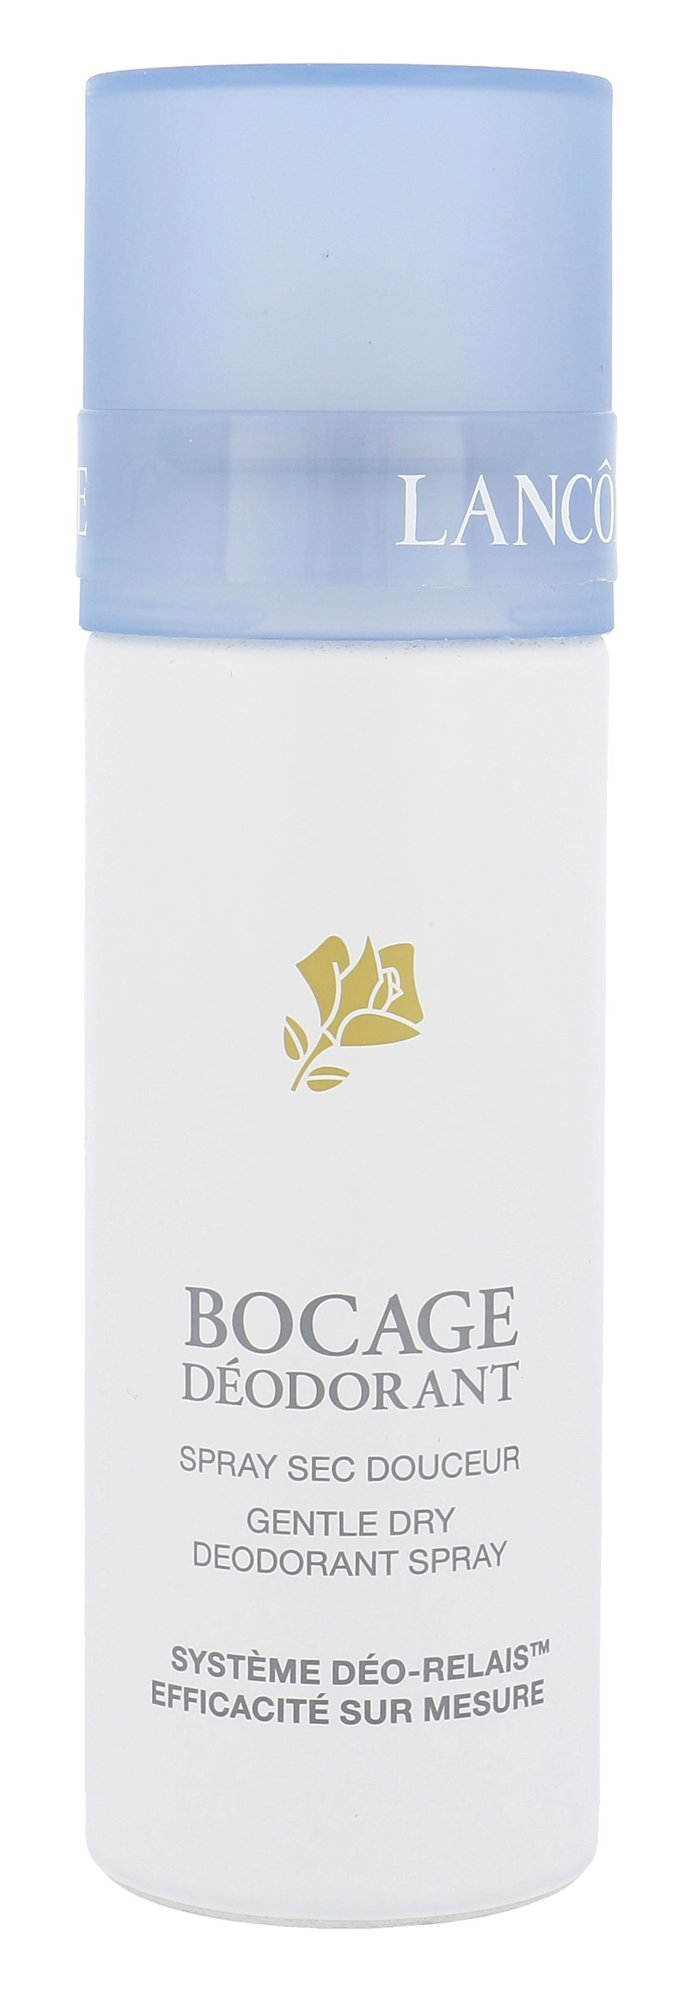 Lancôme Bocage Cosmetic 125ml